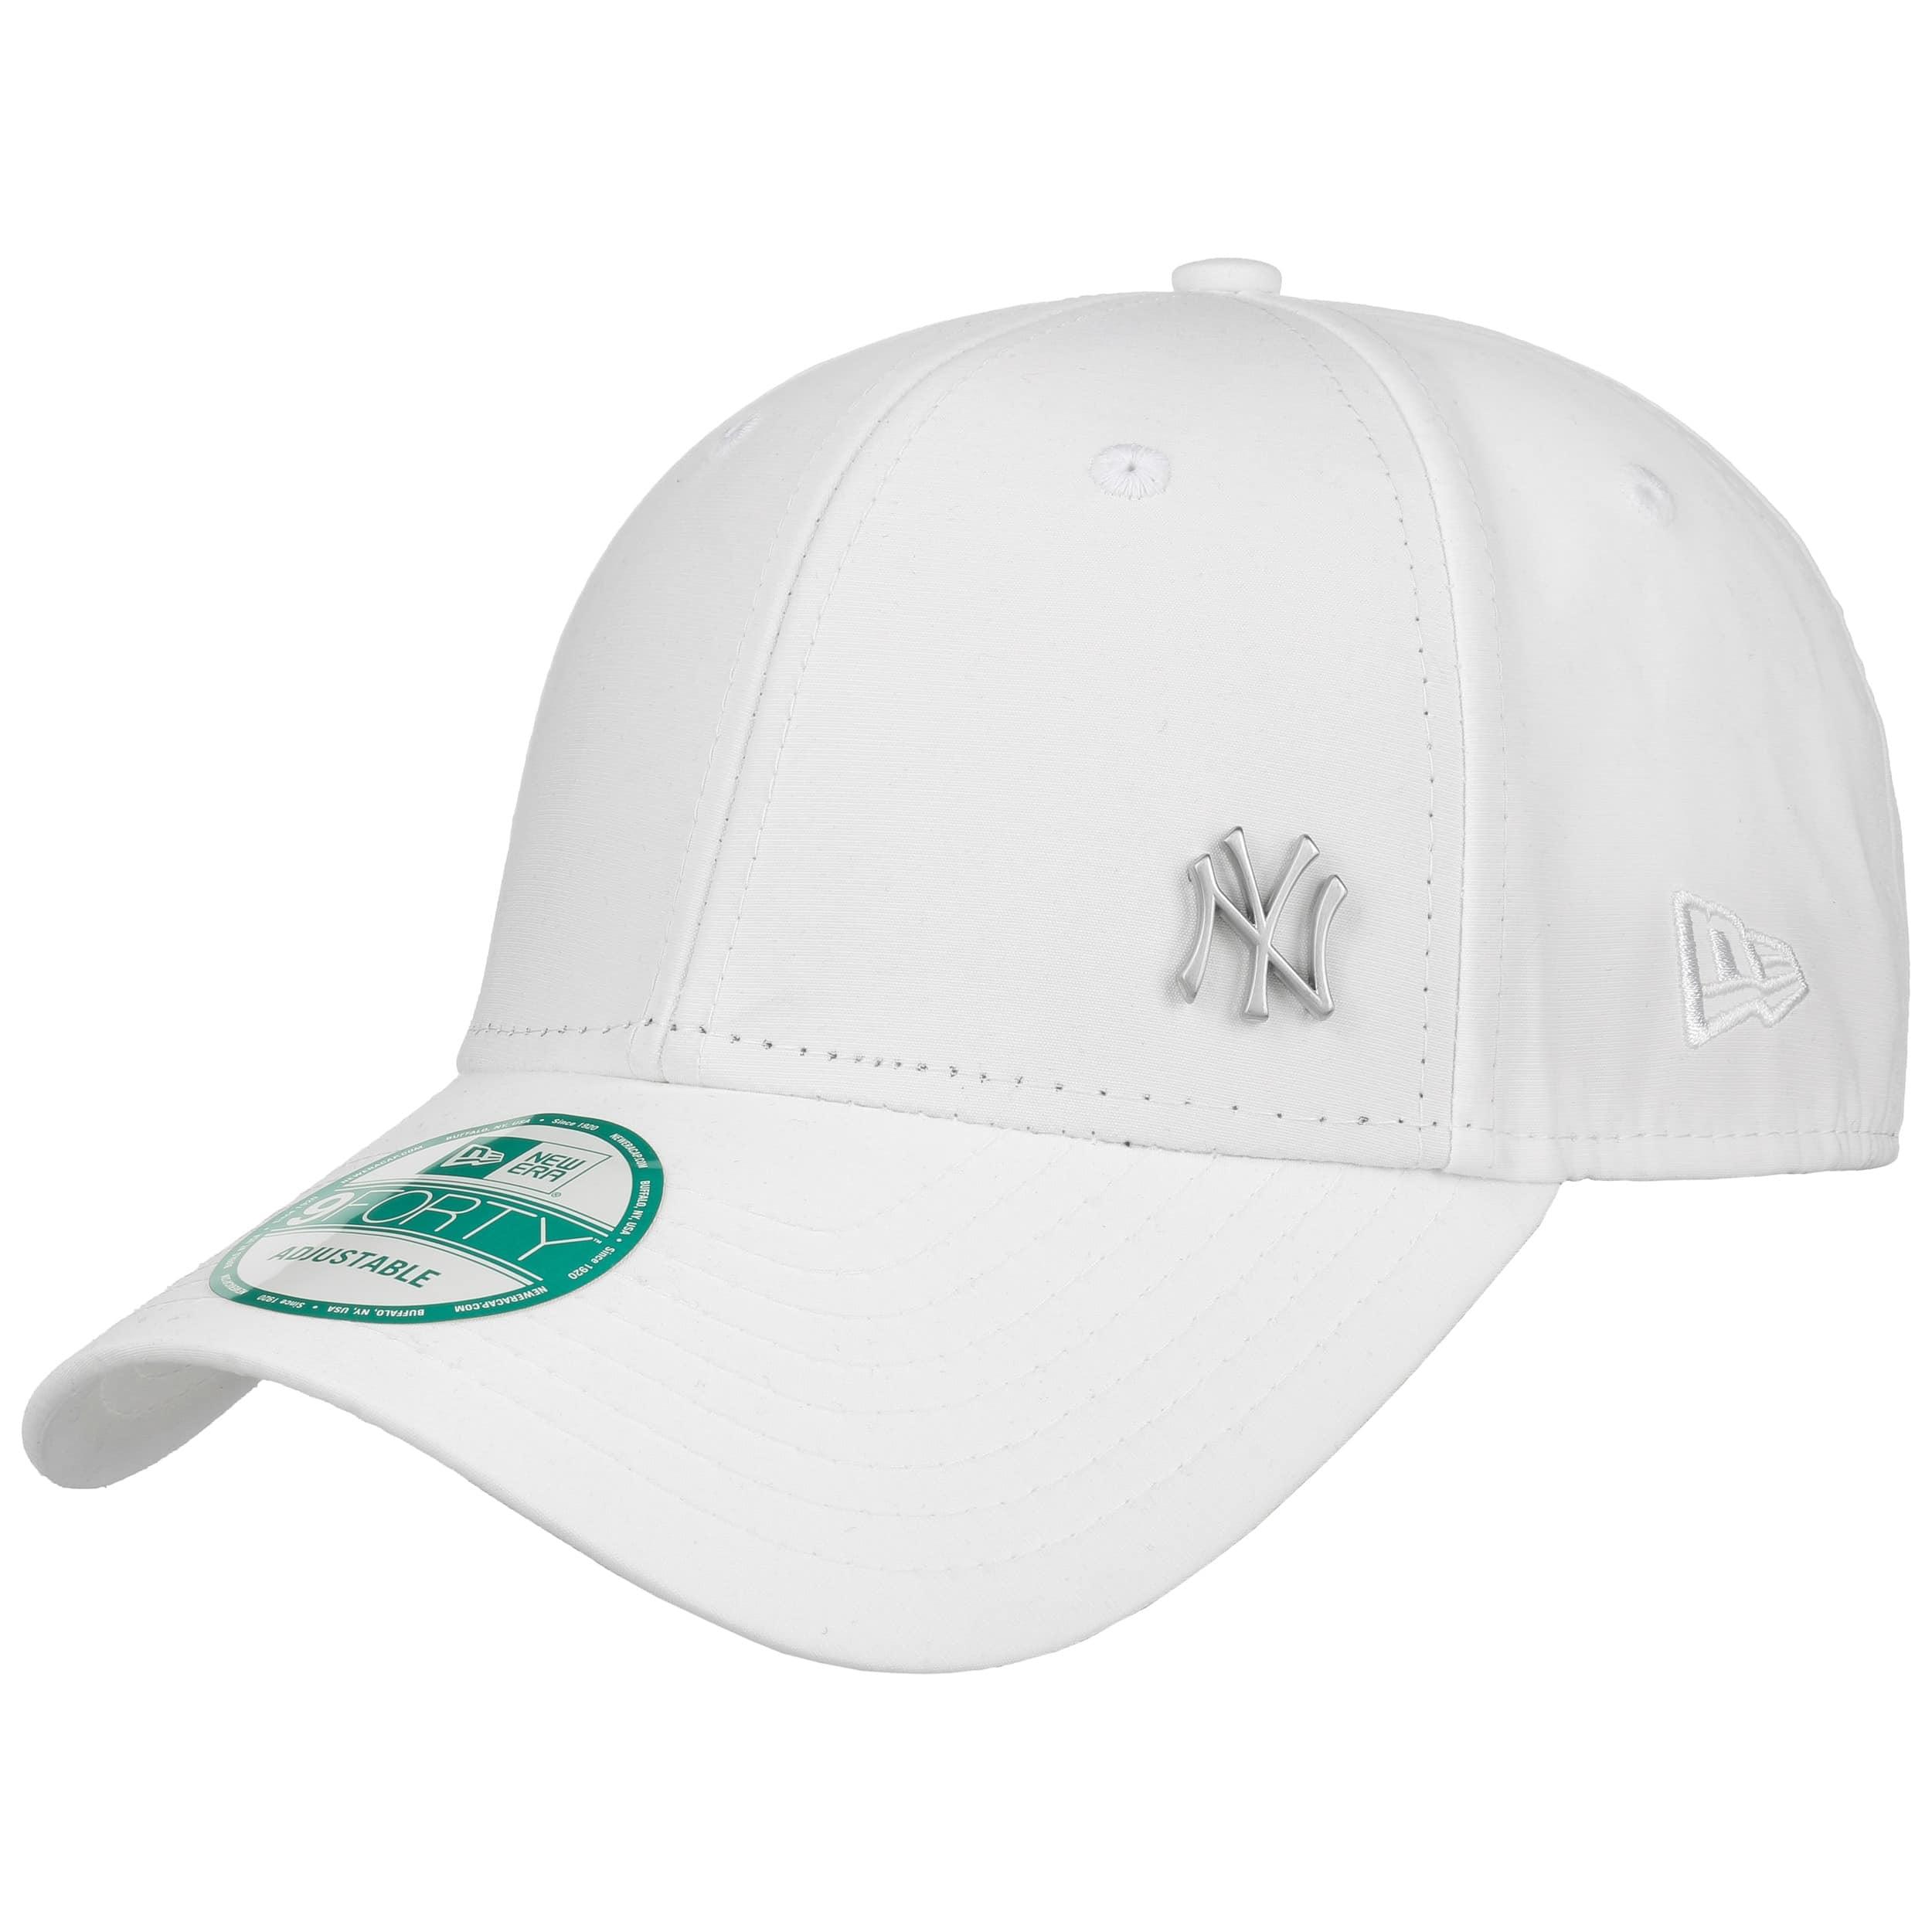 ... 9Forty NY Yankees Strapback Cap by New Era - white 7 45a17e4f090